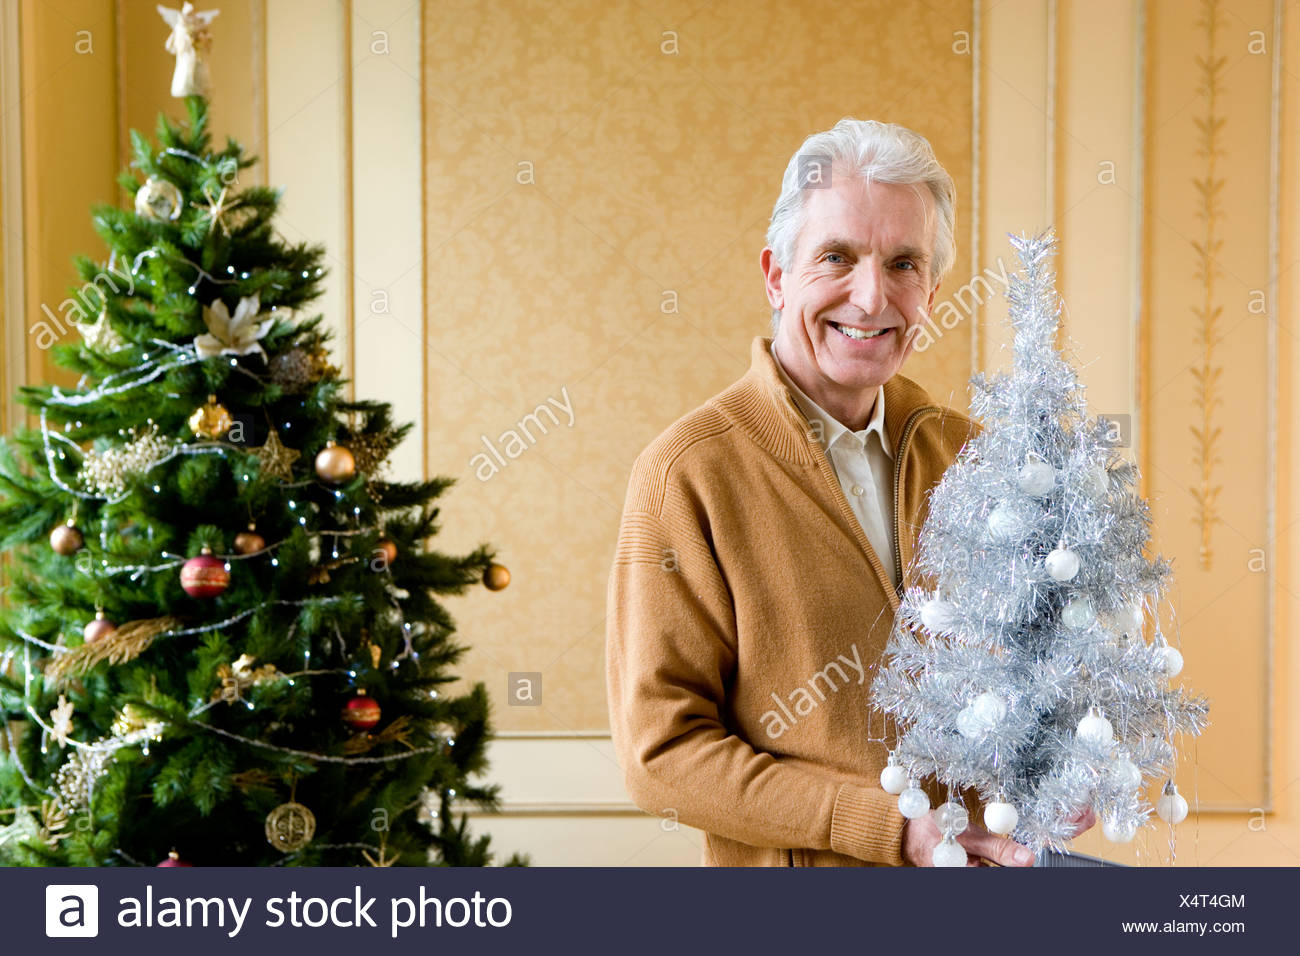 Senior man by Christmas tree with ornamental tree, smiling, portrait - Stock Image